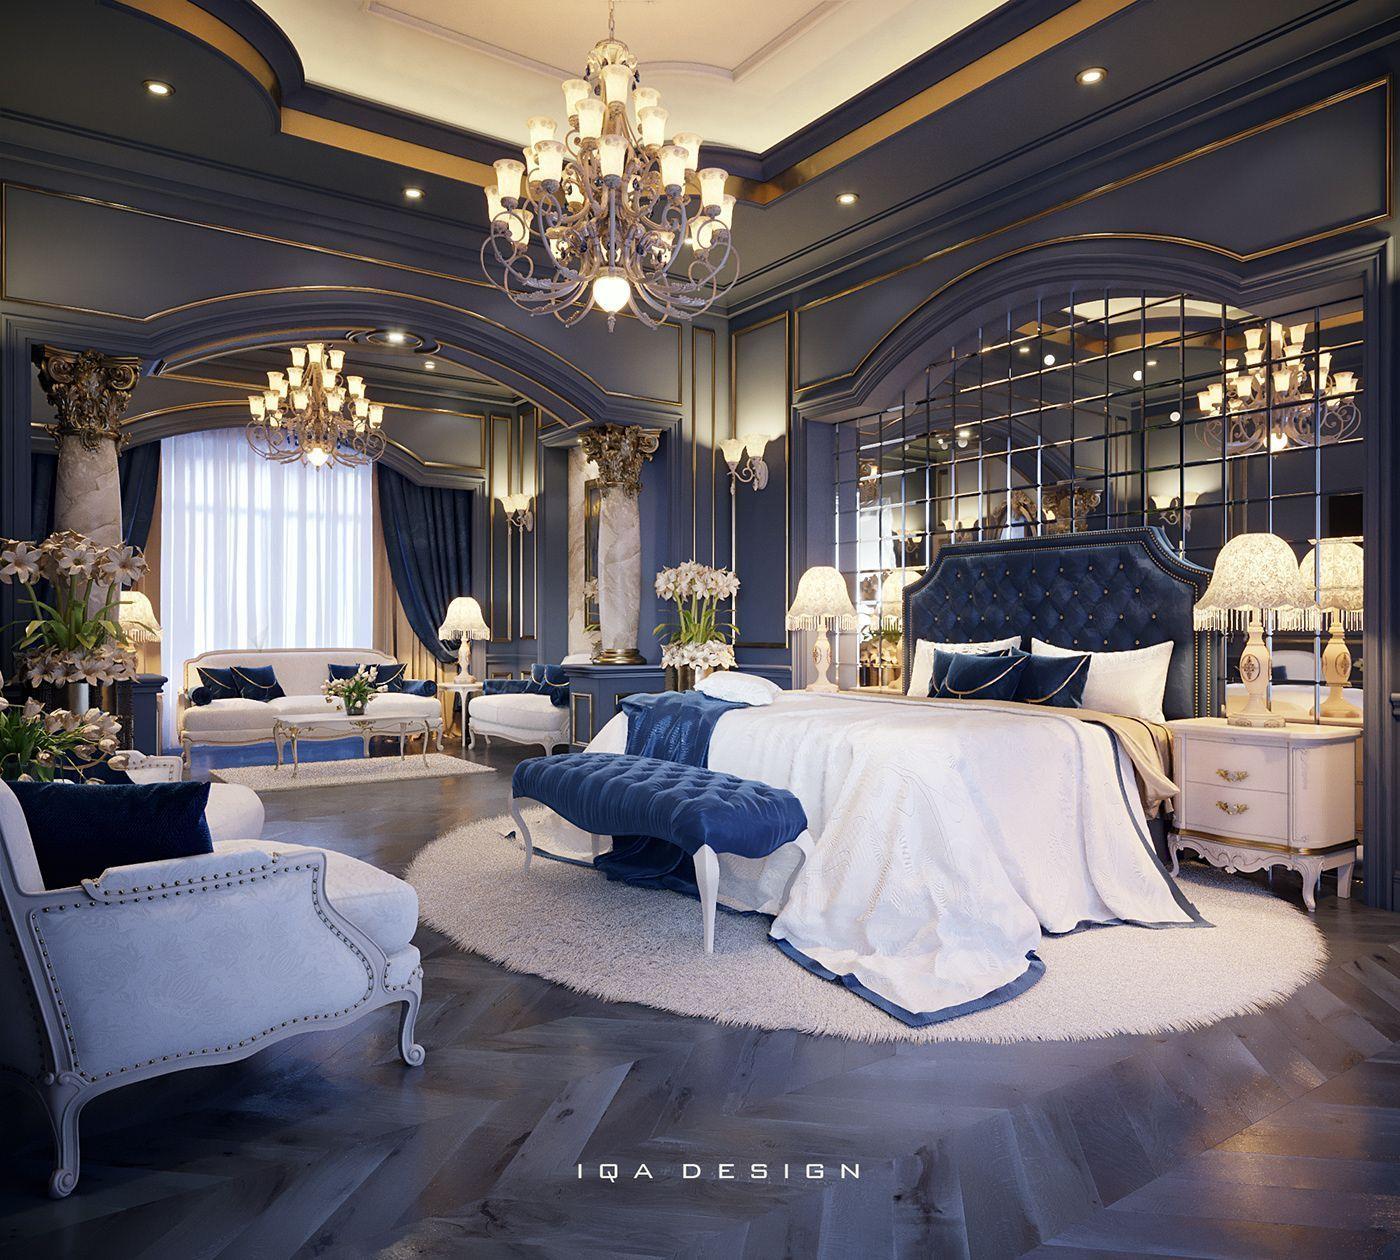 Luxury Master Bedroom On Behance Luxurymasterbedroomsfloorplans Luxurymasterbedroomfurniturese Luxury Bedroom Master Luxurious Bedrooms Luxury Bedroom Design Luxury master bedroom photo